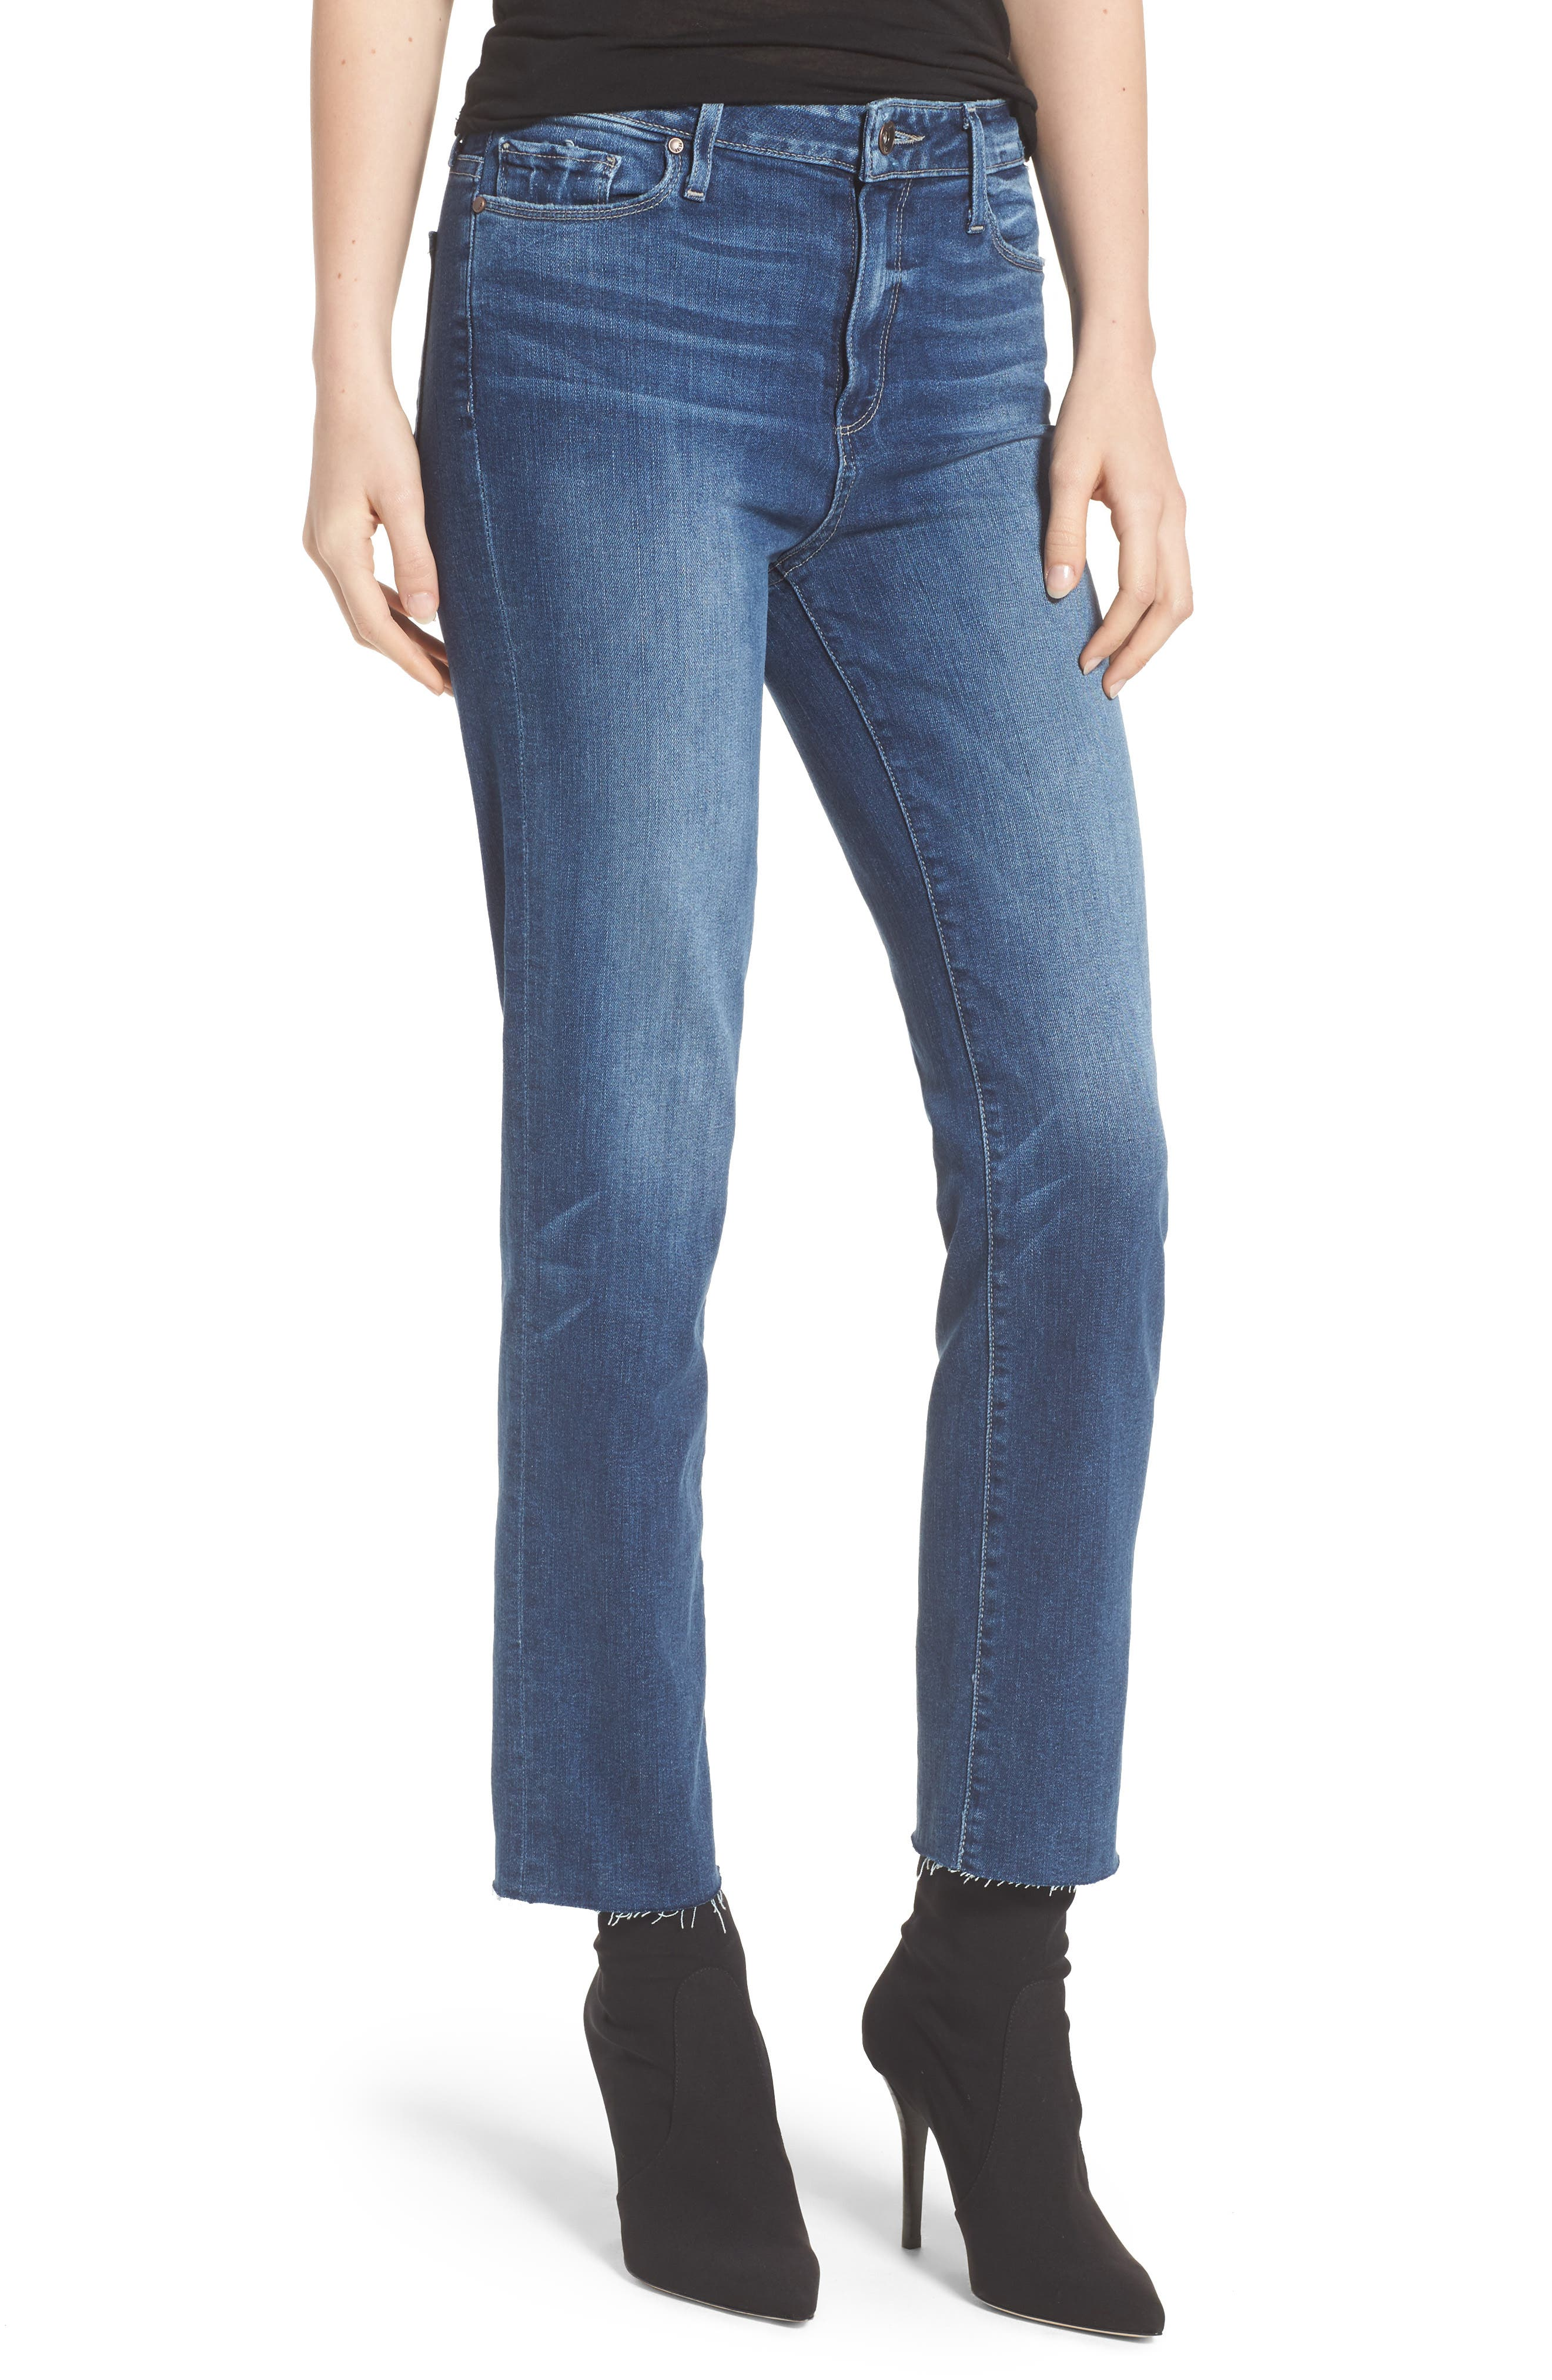 Transcend - Hoxton Ankle Straight Leg Jeans,                         Main,                         color, Malibu